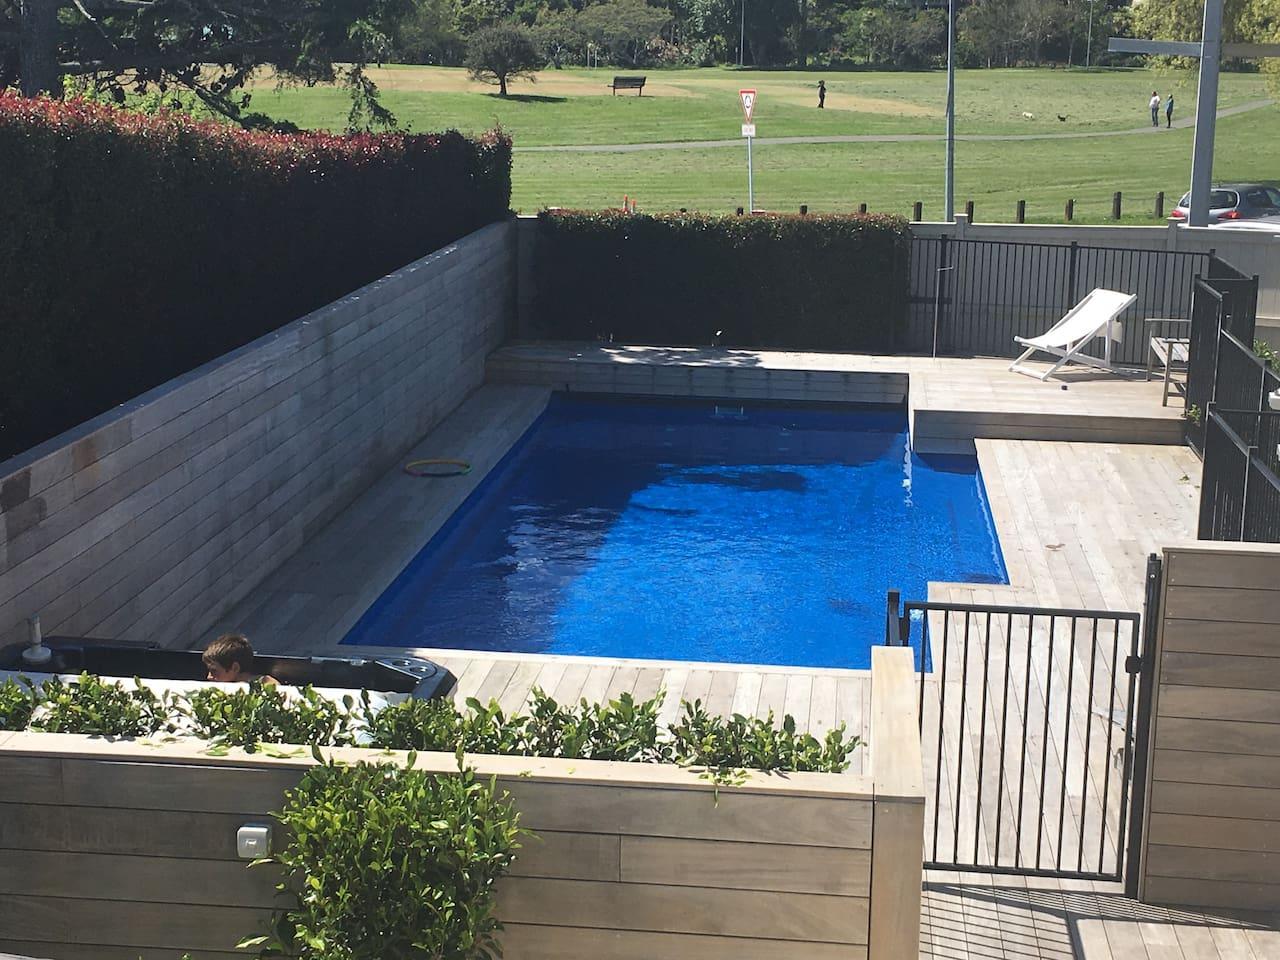 Parkside Kohimarama with spa and pool